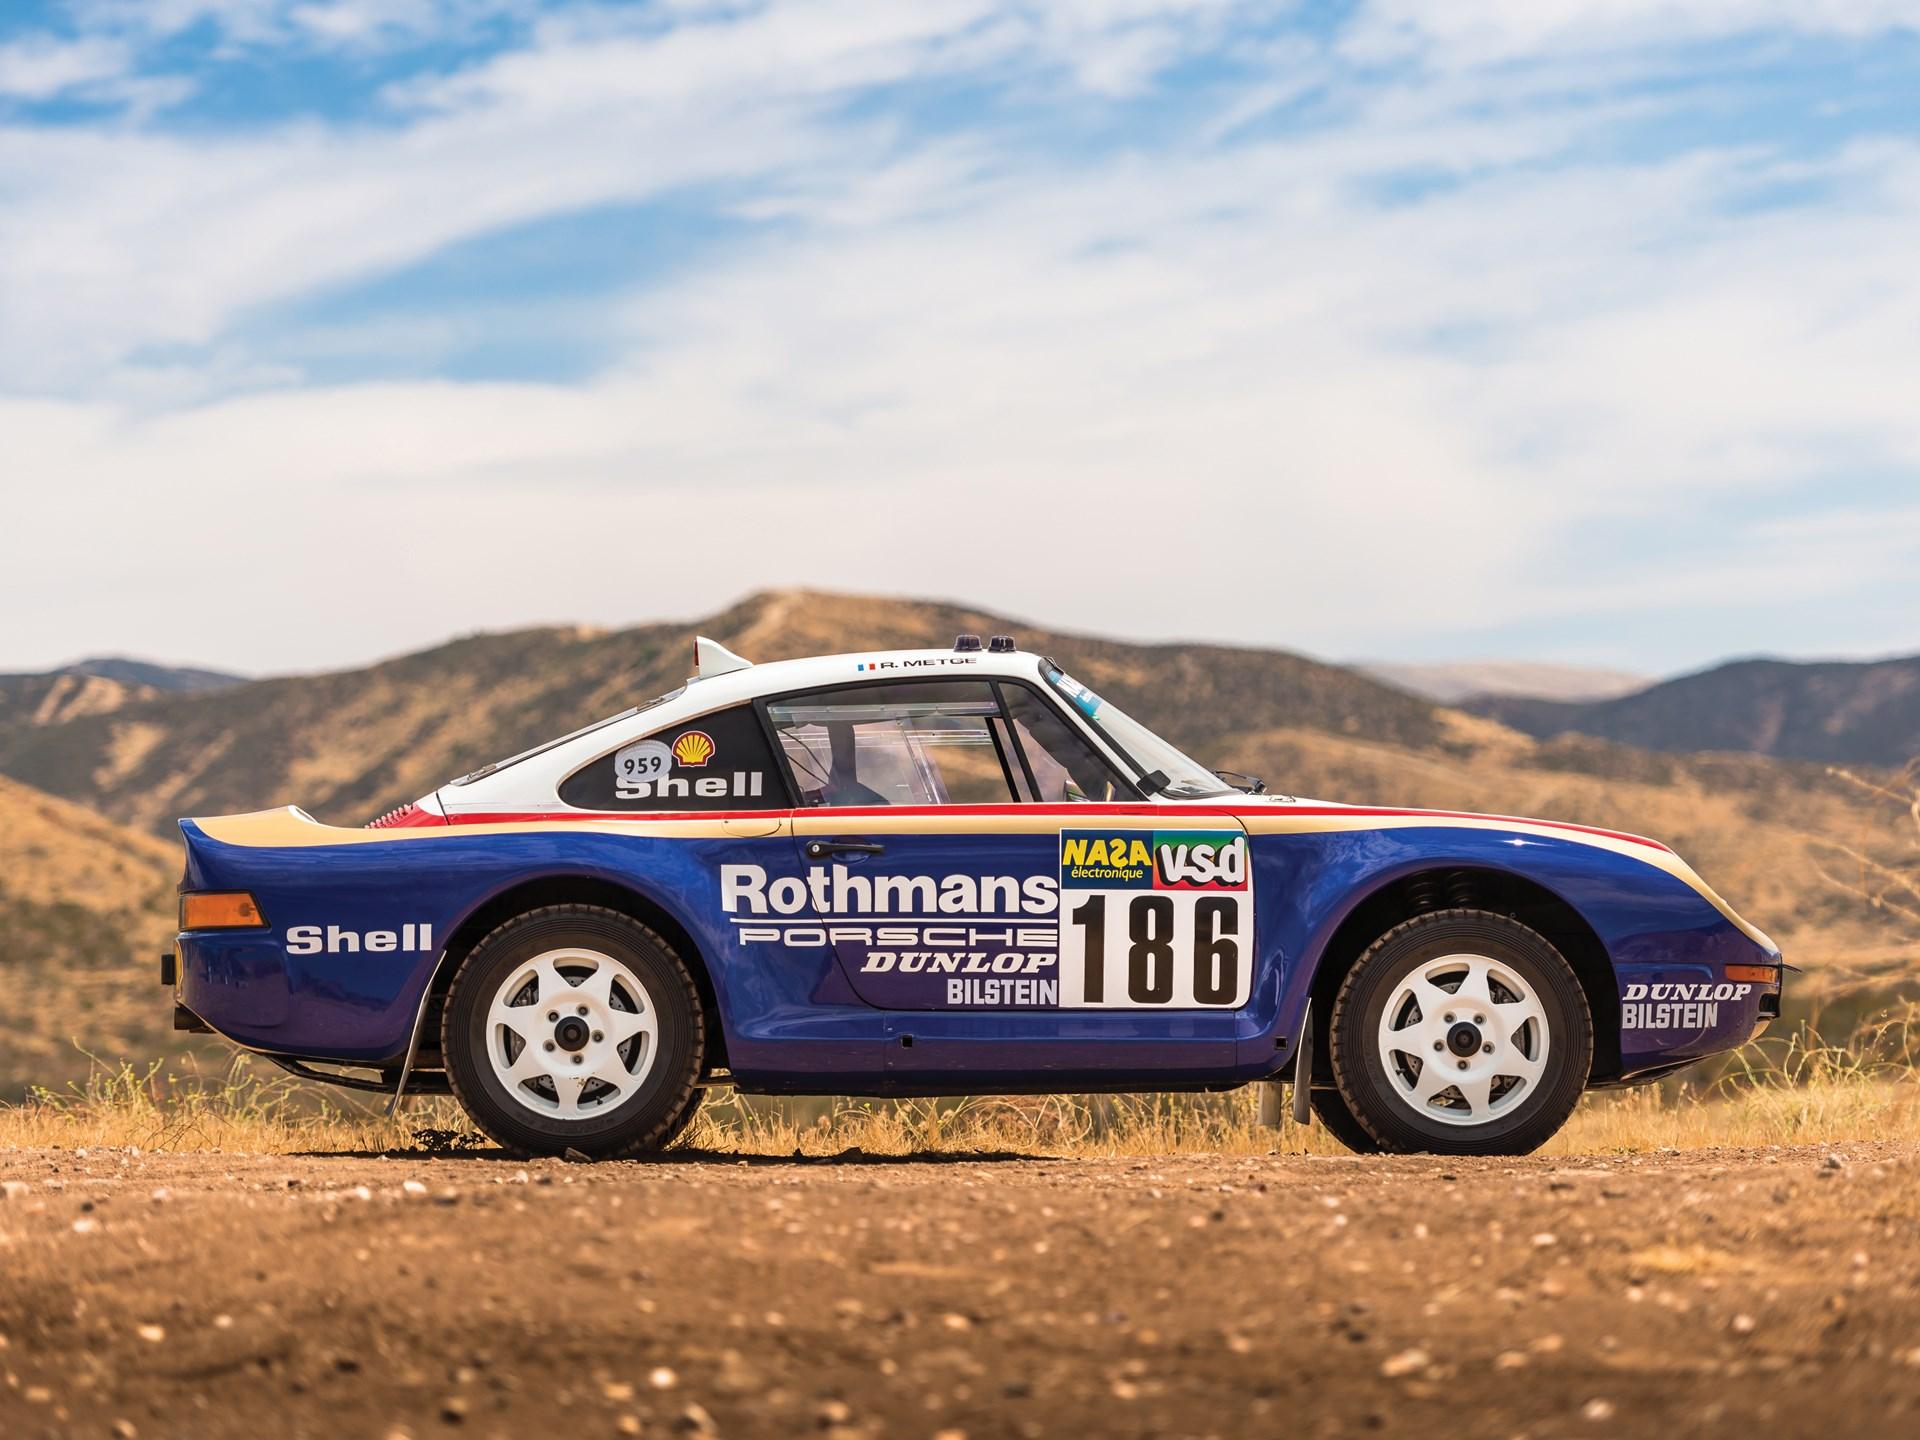 1985 Porsche 959 Paris-Dakar side profile